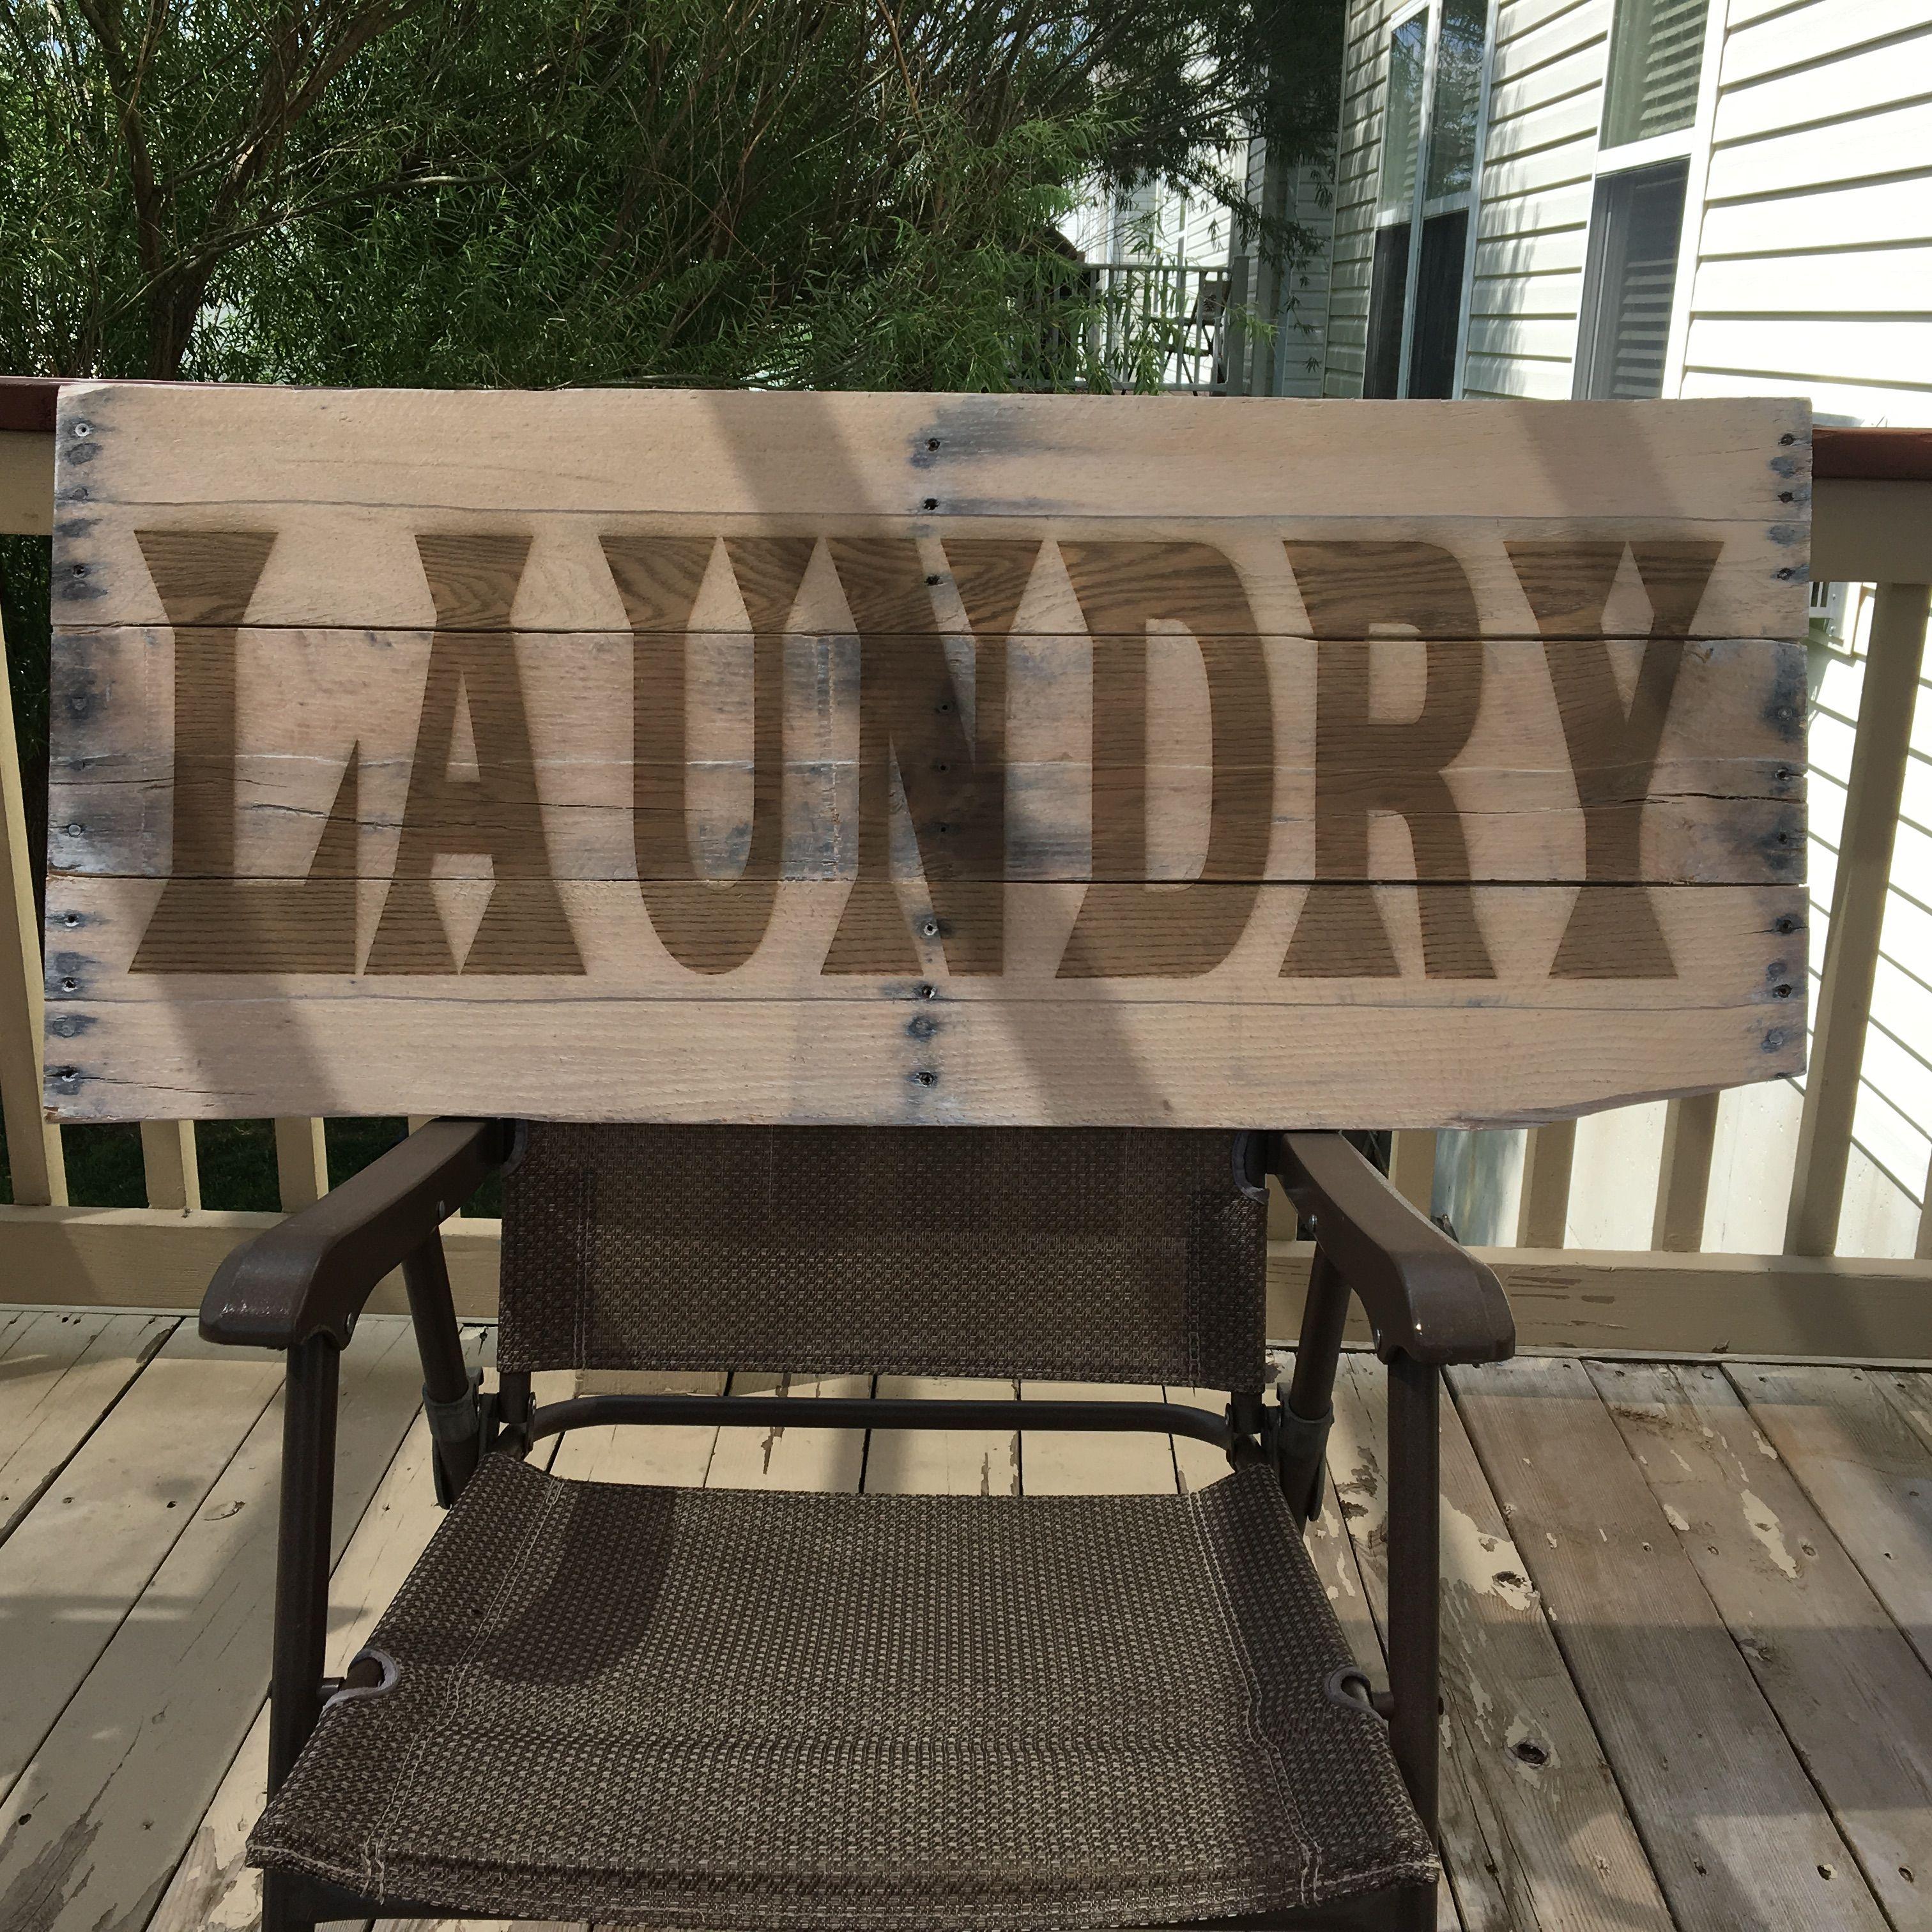 40x16 Laundry sign. Pallet wood @fullspectrumlaser # ...